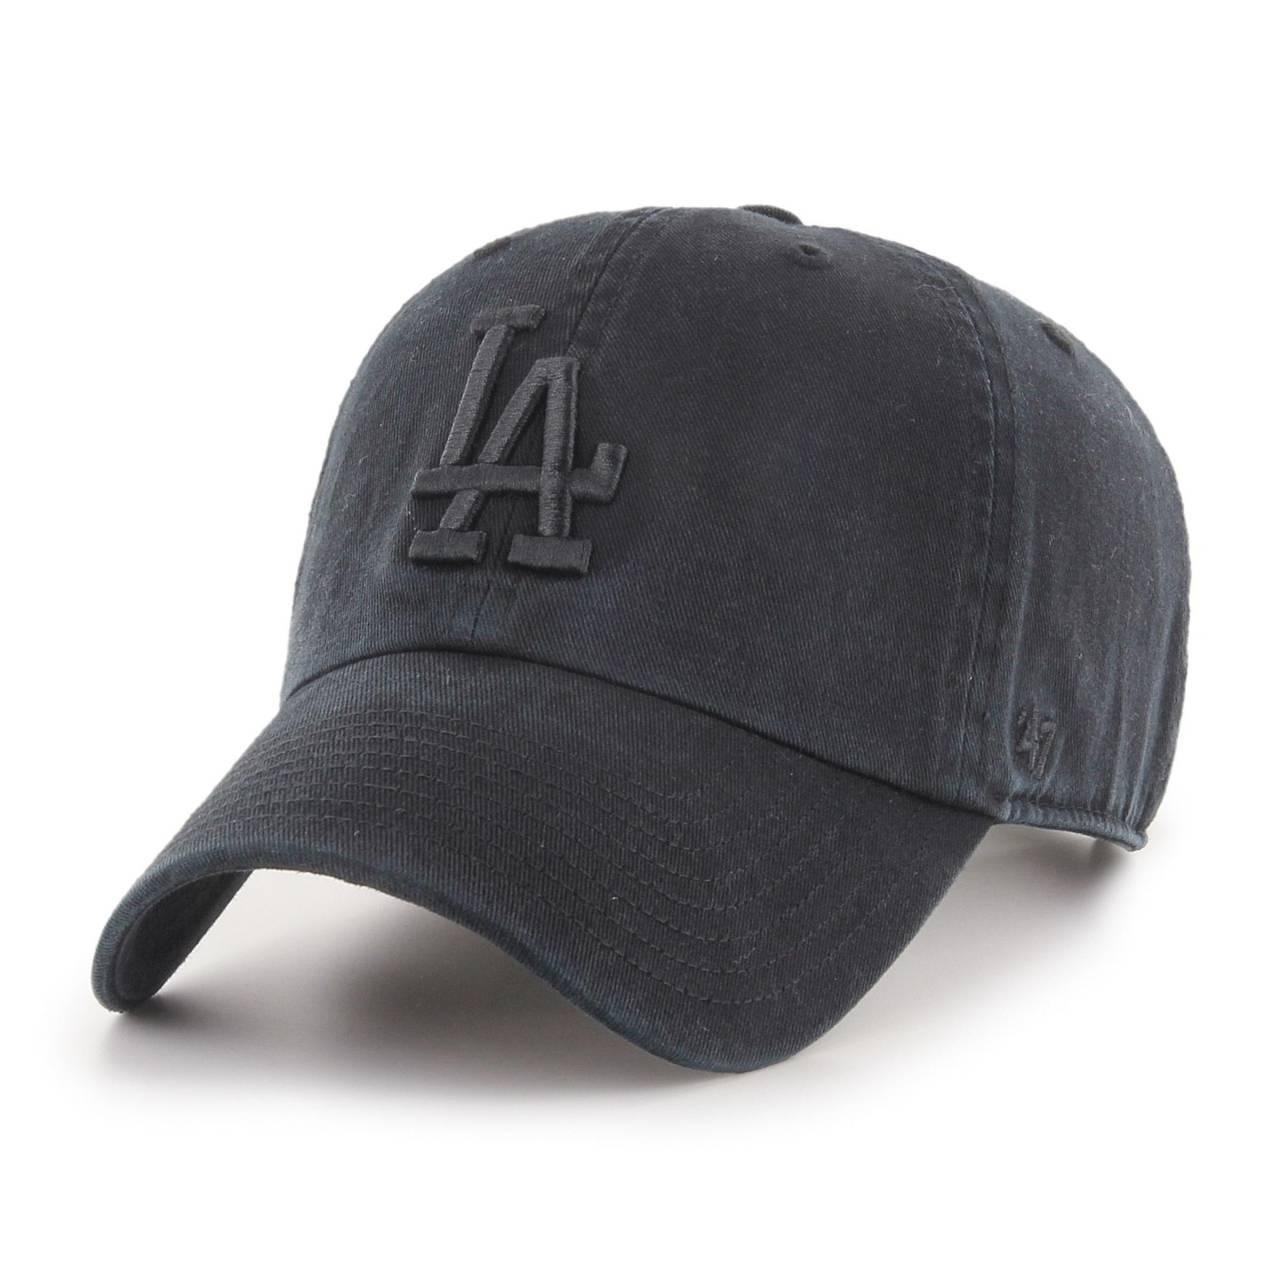 MLB LOS ANGELES DODGERS '47 CLEAN UP BLACK/BLACK CAP